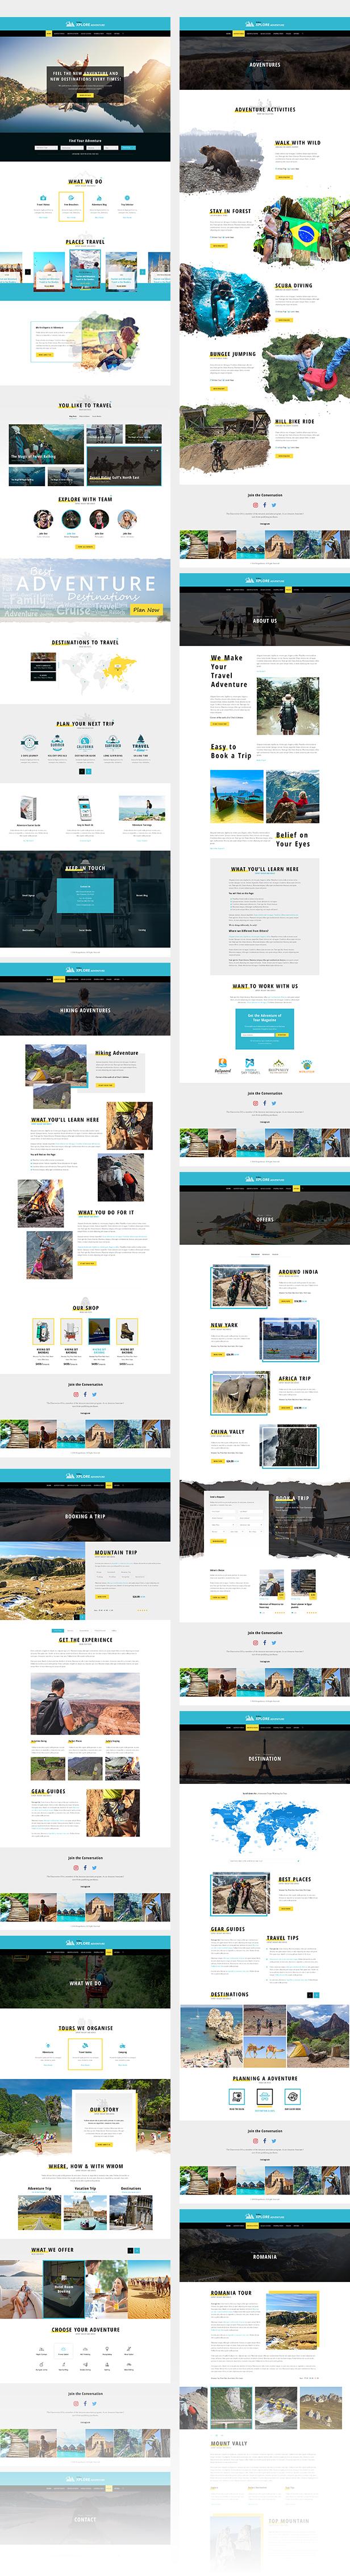 Xplore - Adventure and Travel PSD Template - 1